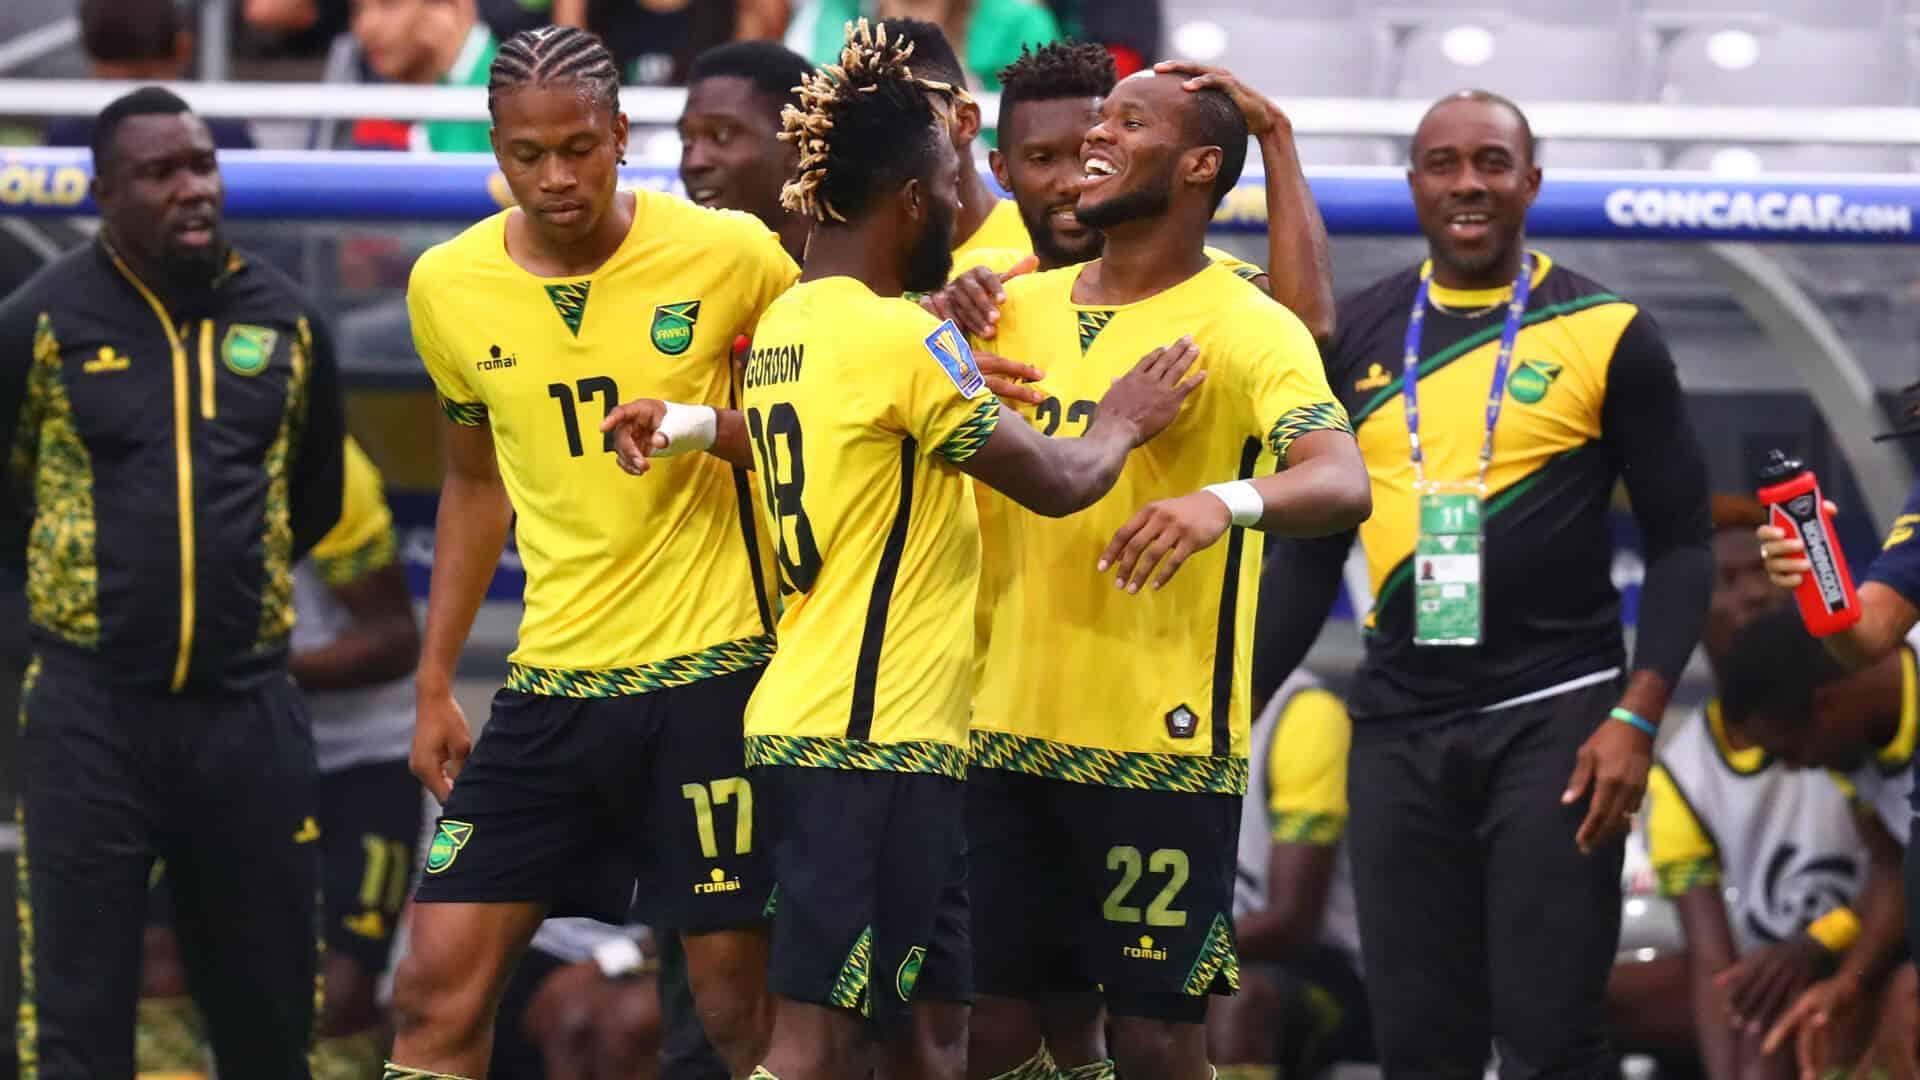 JAMAICA NATIONAL FC SOCCER TEAM 2019